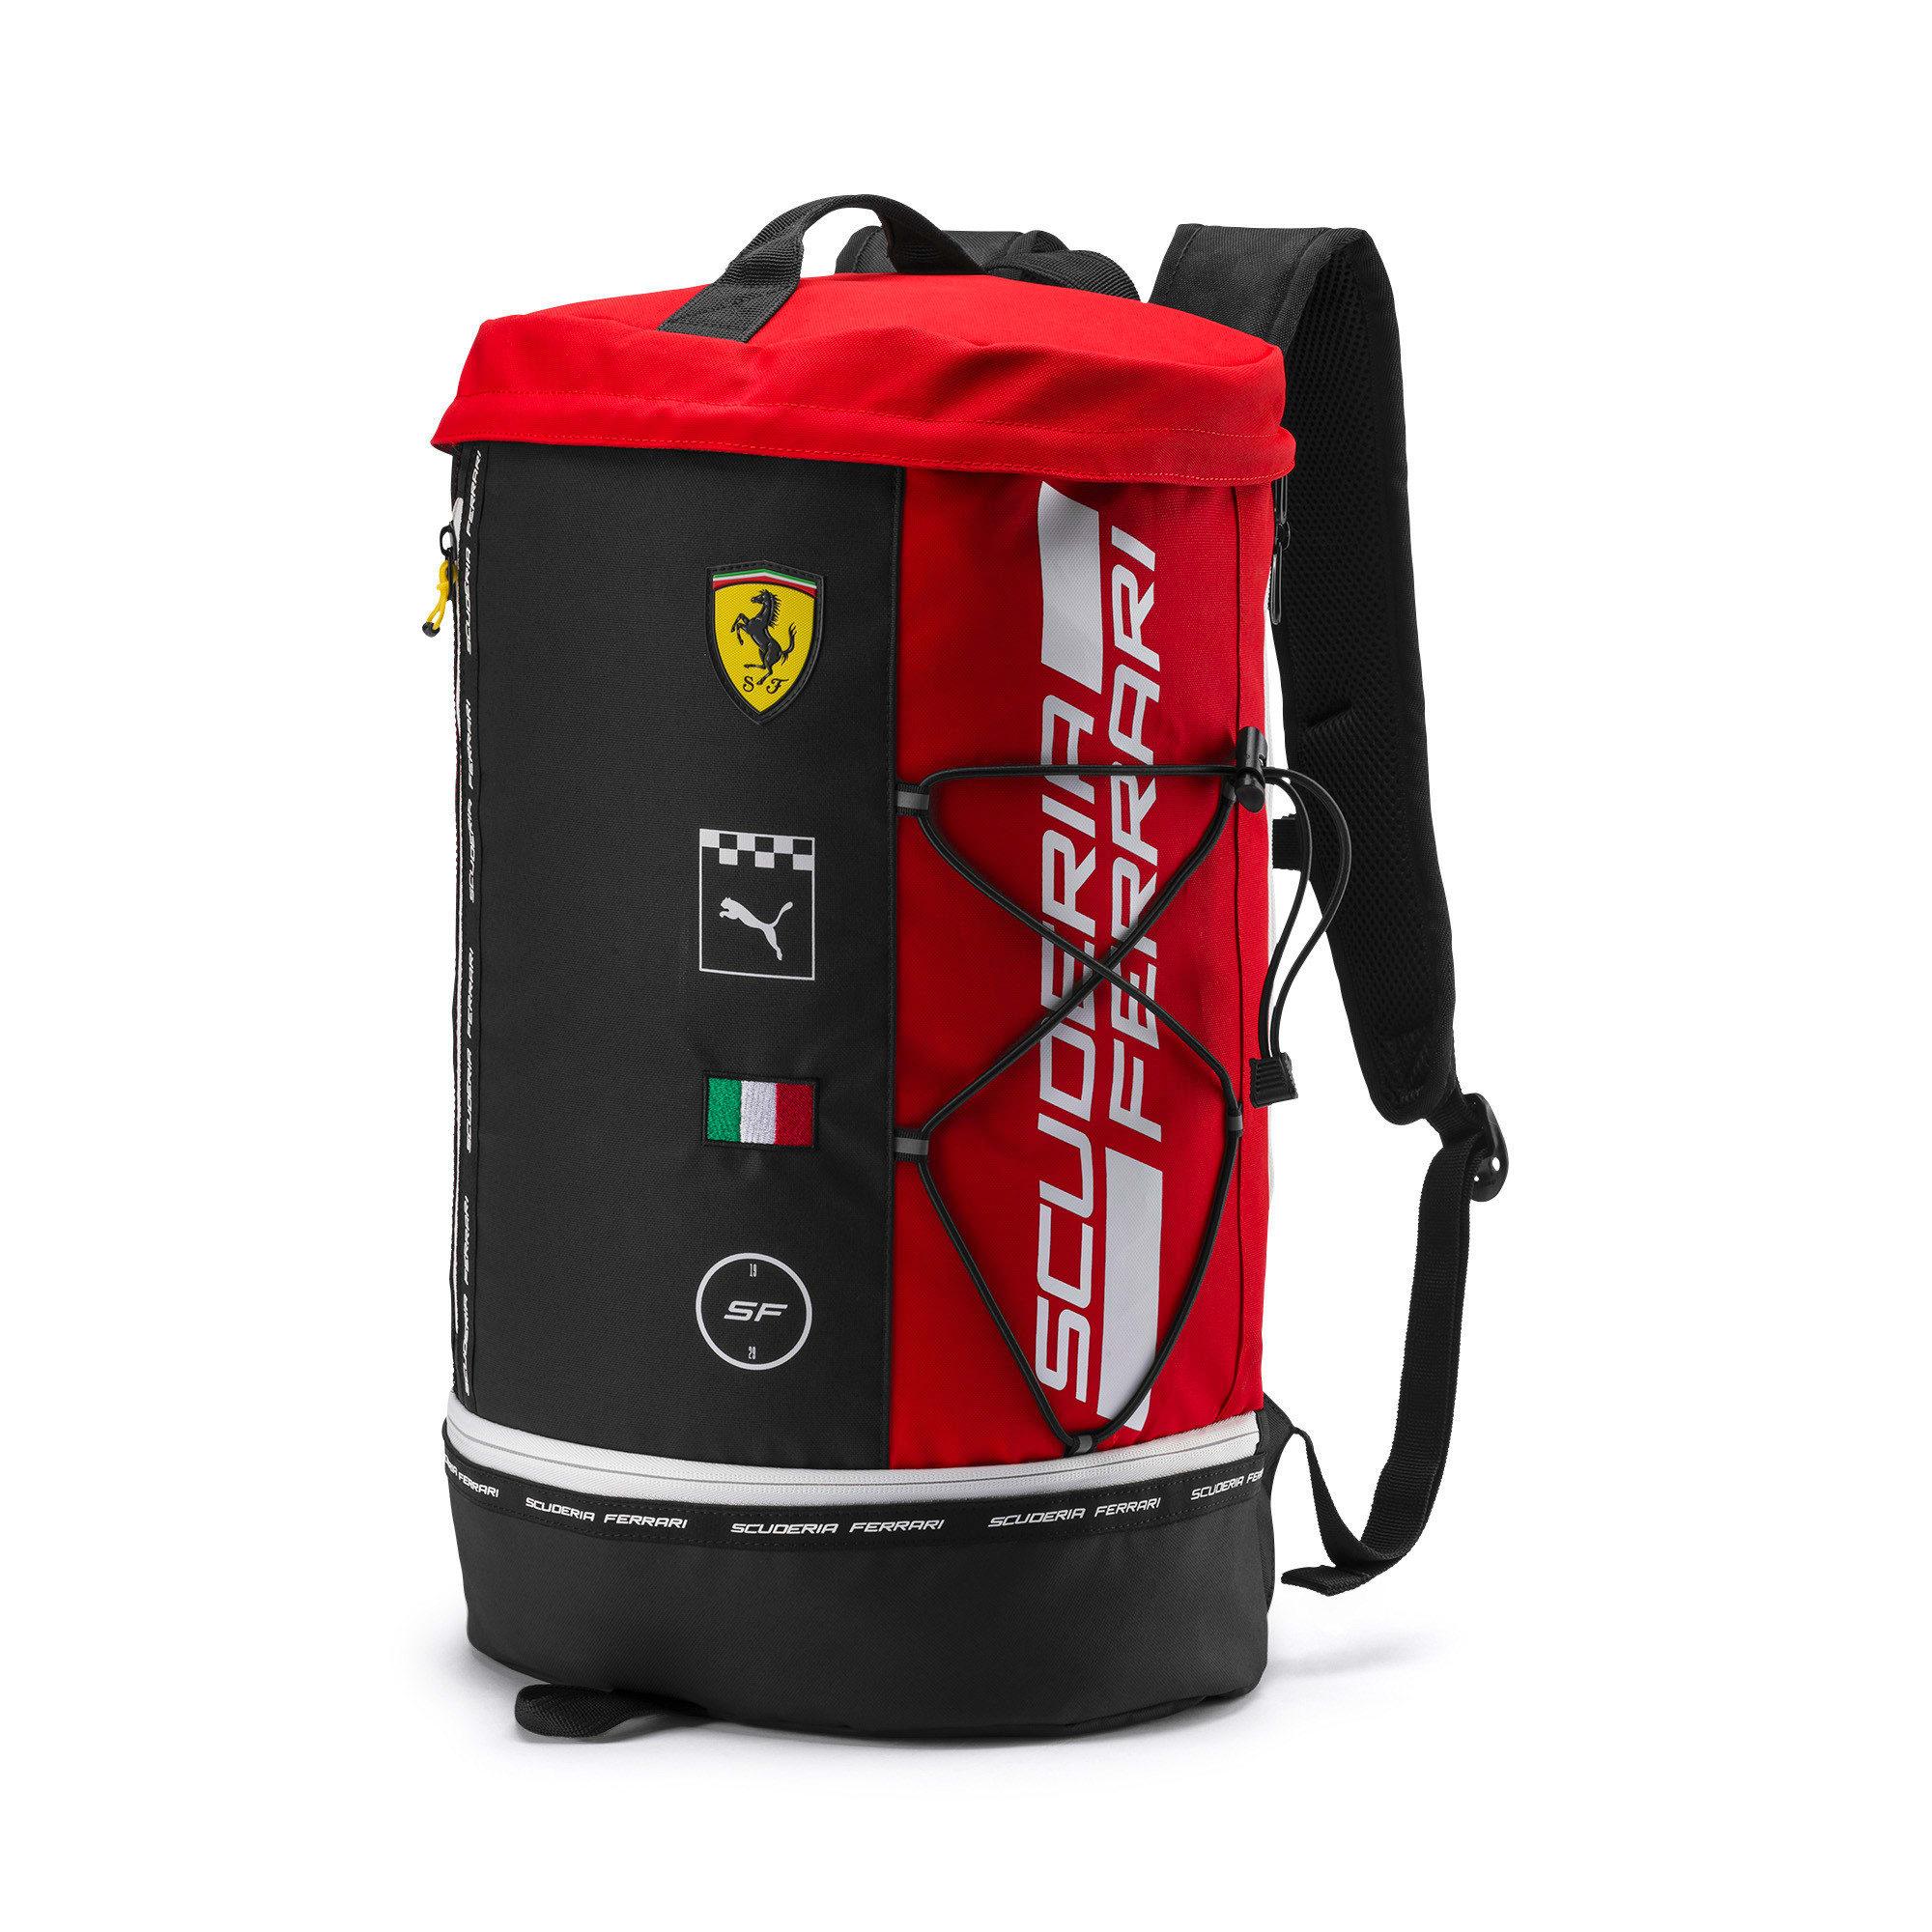 Thumbnail 1 of Ferrari Fanwear RCT Backpack, Rosso Corsa, medium